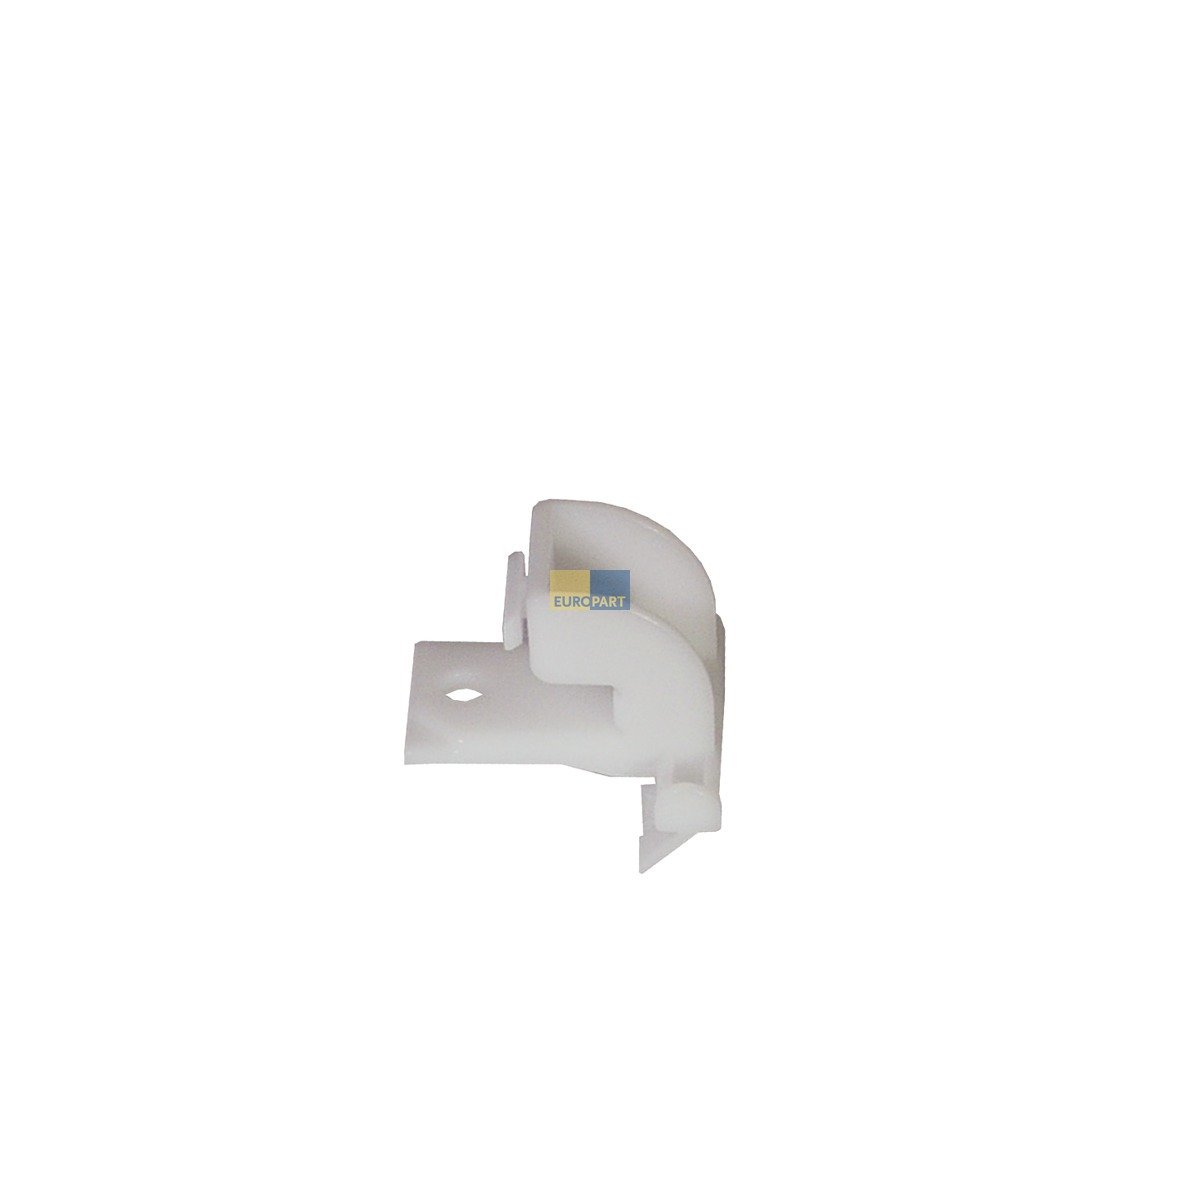 Ger/ätedeckelklemmst/ück Klemmst/ück Waschmaschine Trockner Miele 6850210